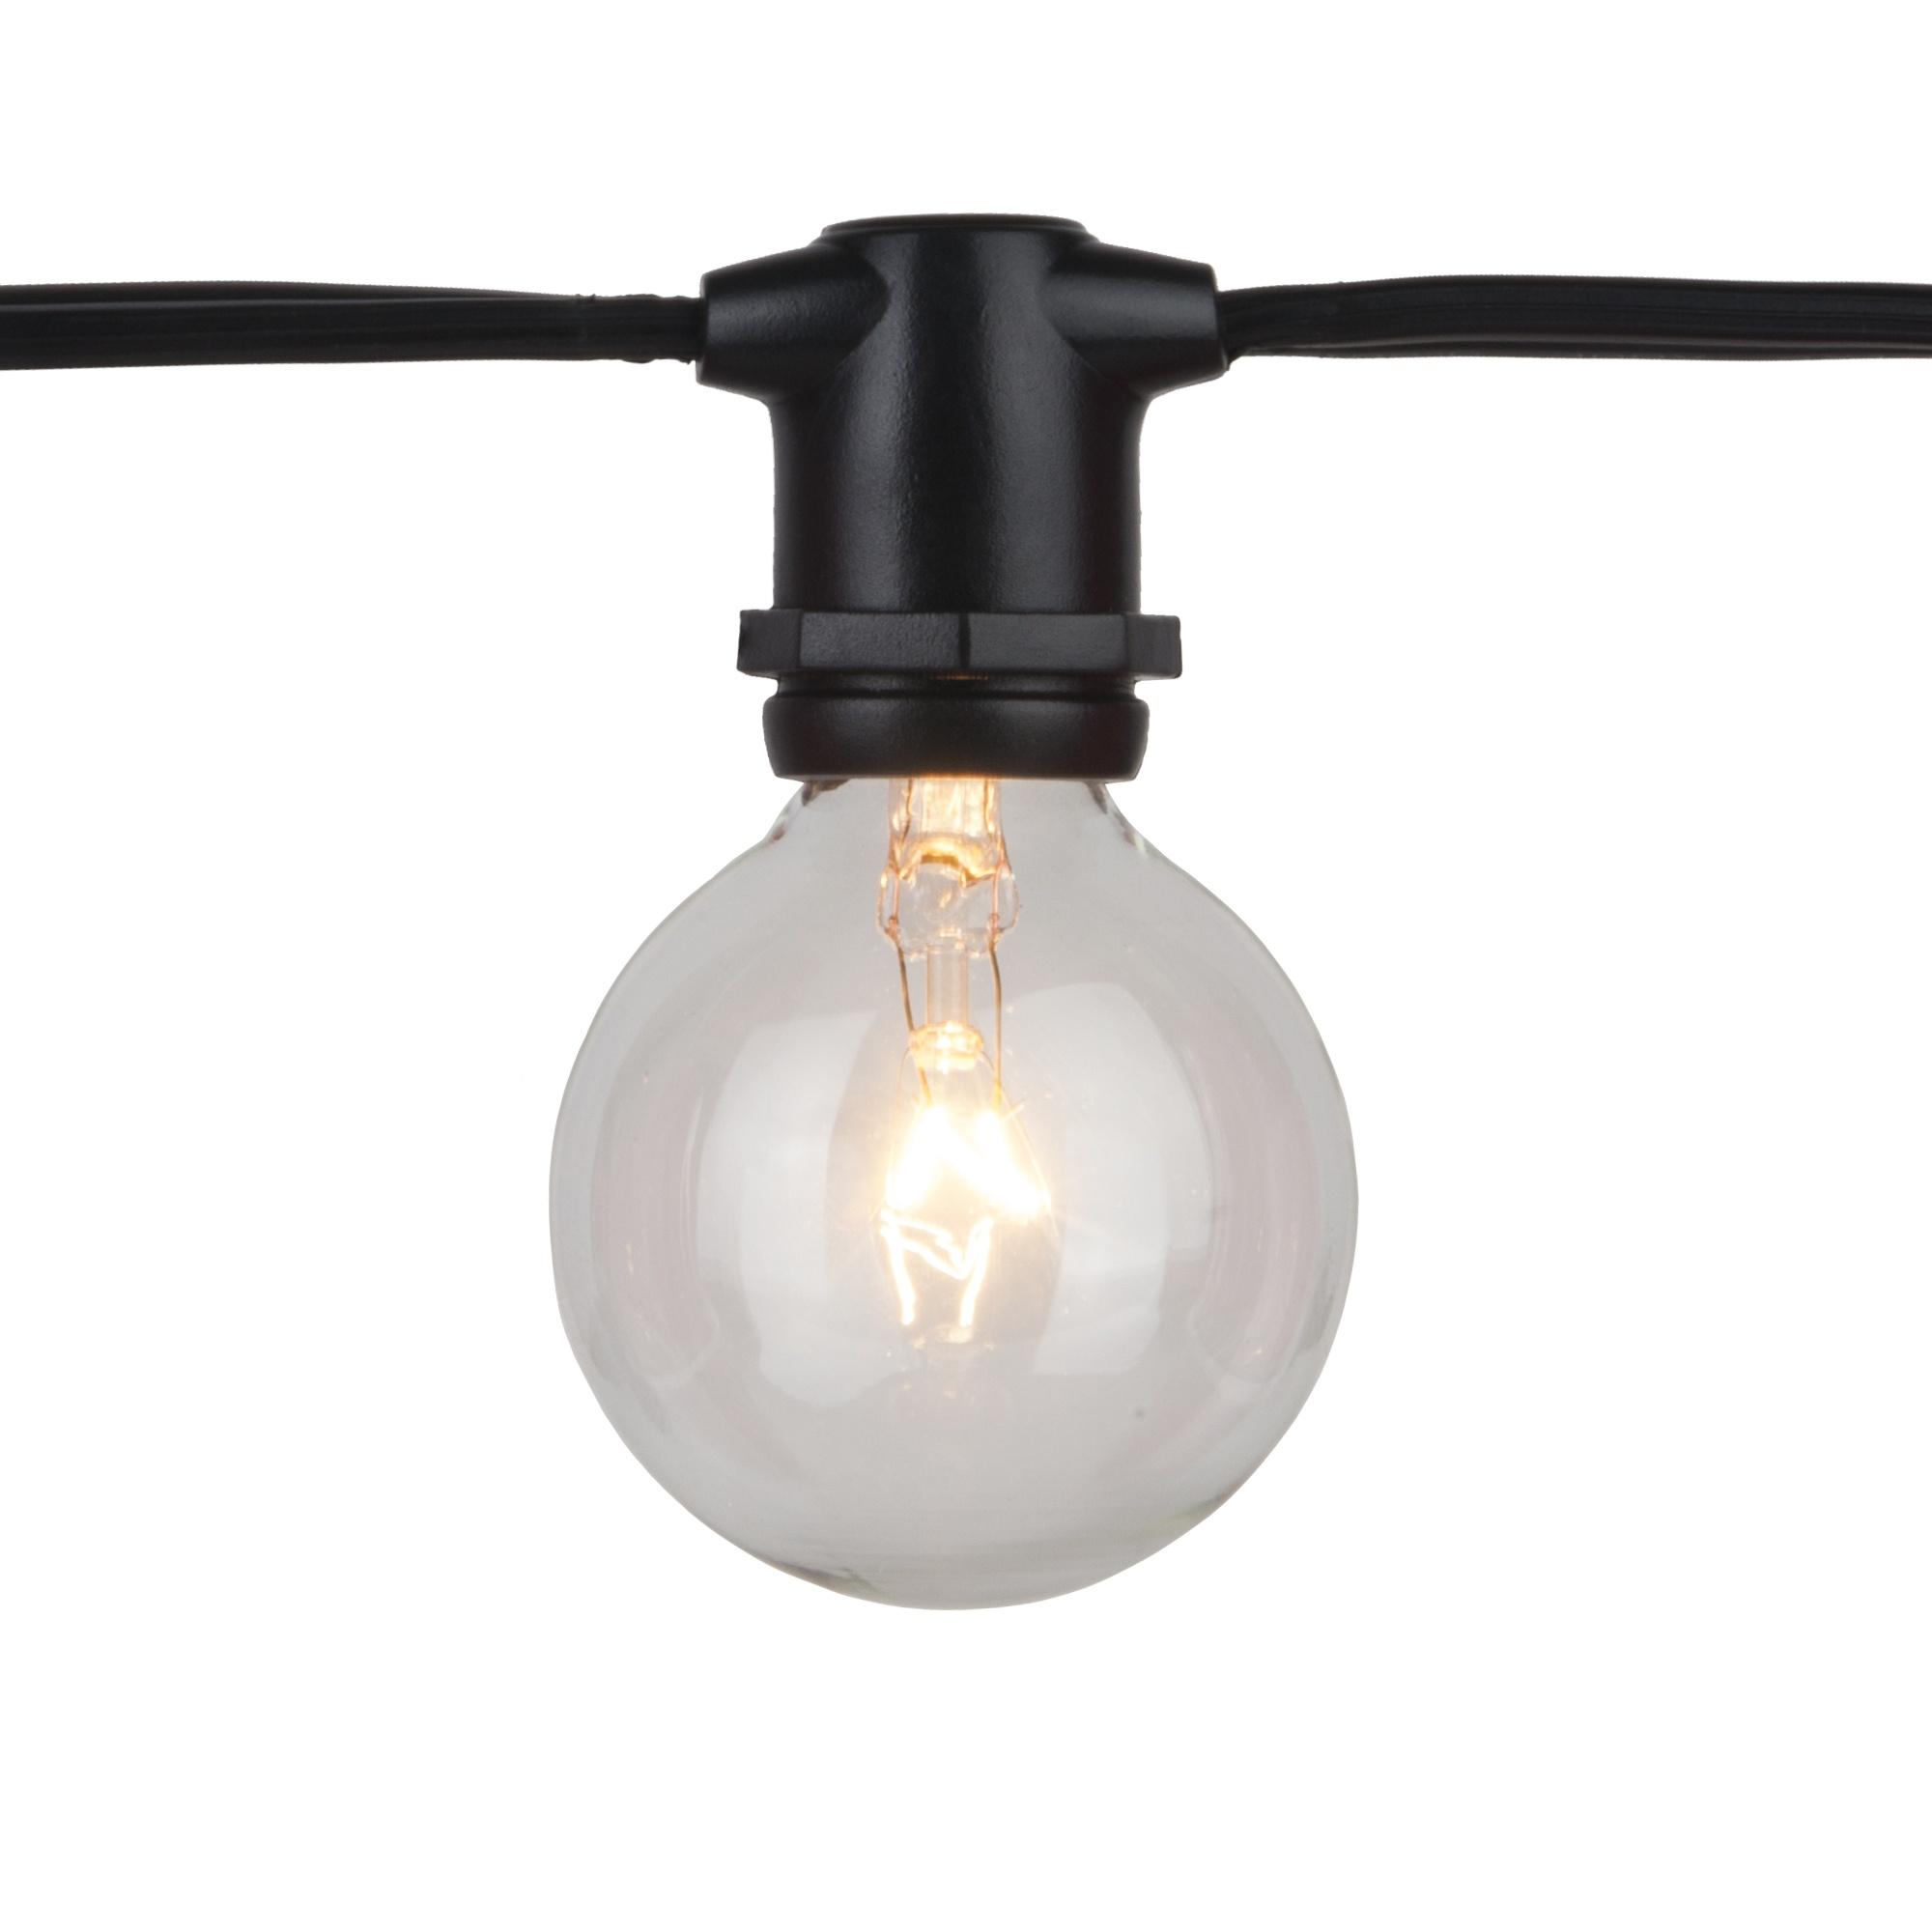 C9 mercial Patio Light String E17 Intermediate Sockets